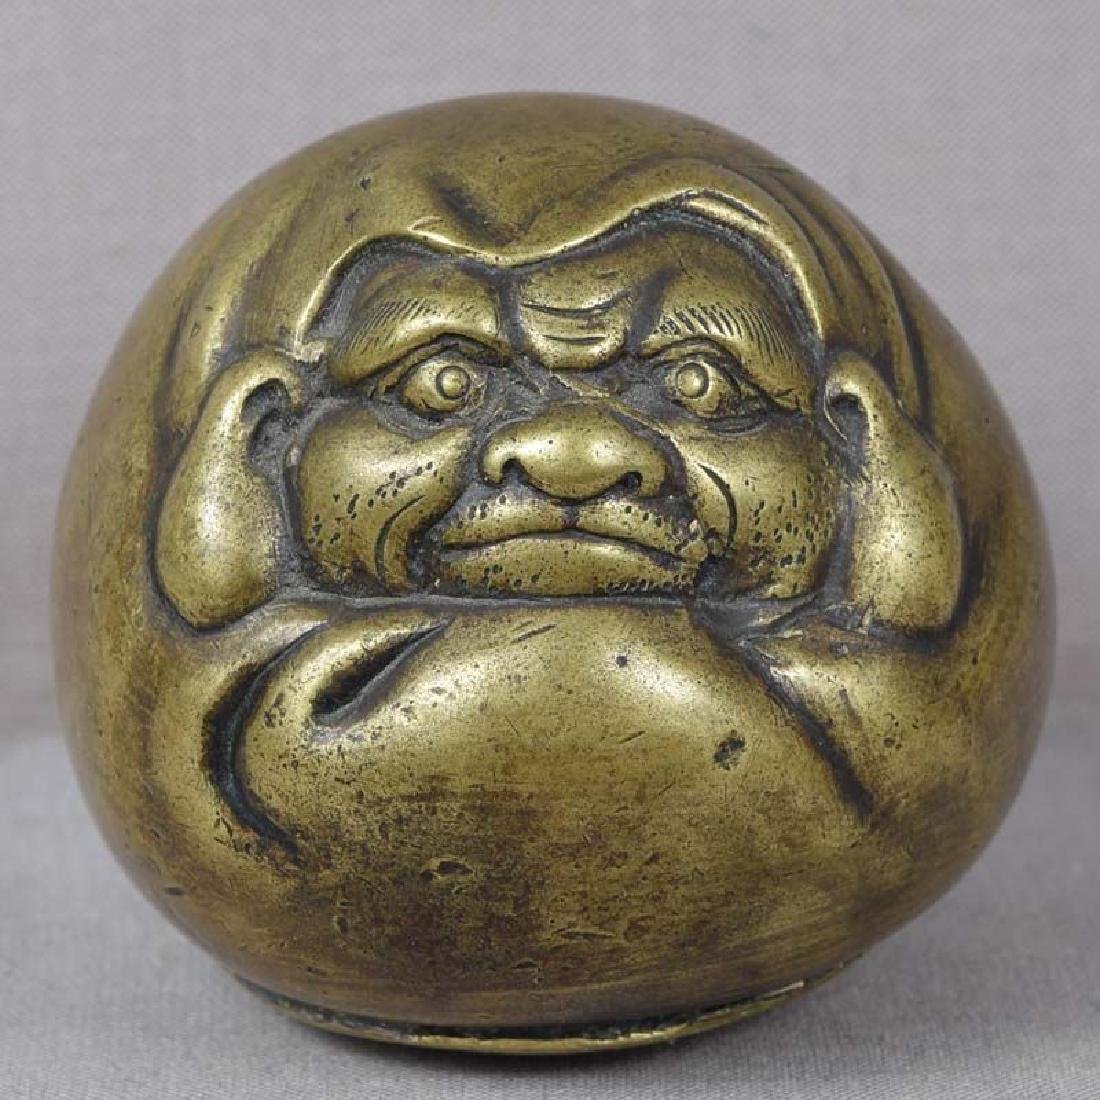 Antique Japanese Bronze Scholar's Daruma Scroll Weight